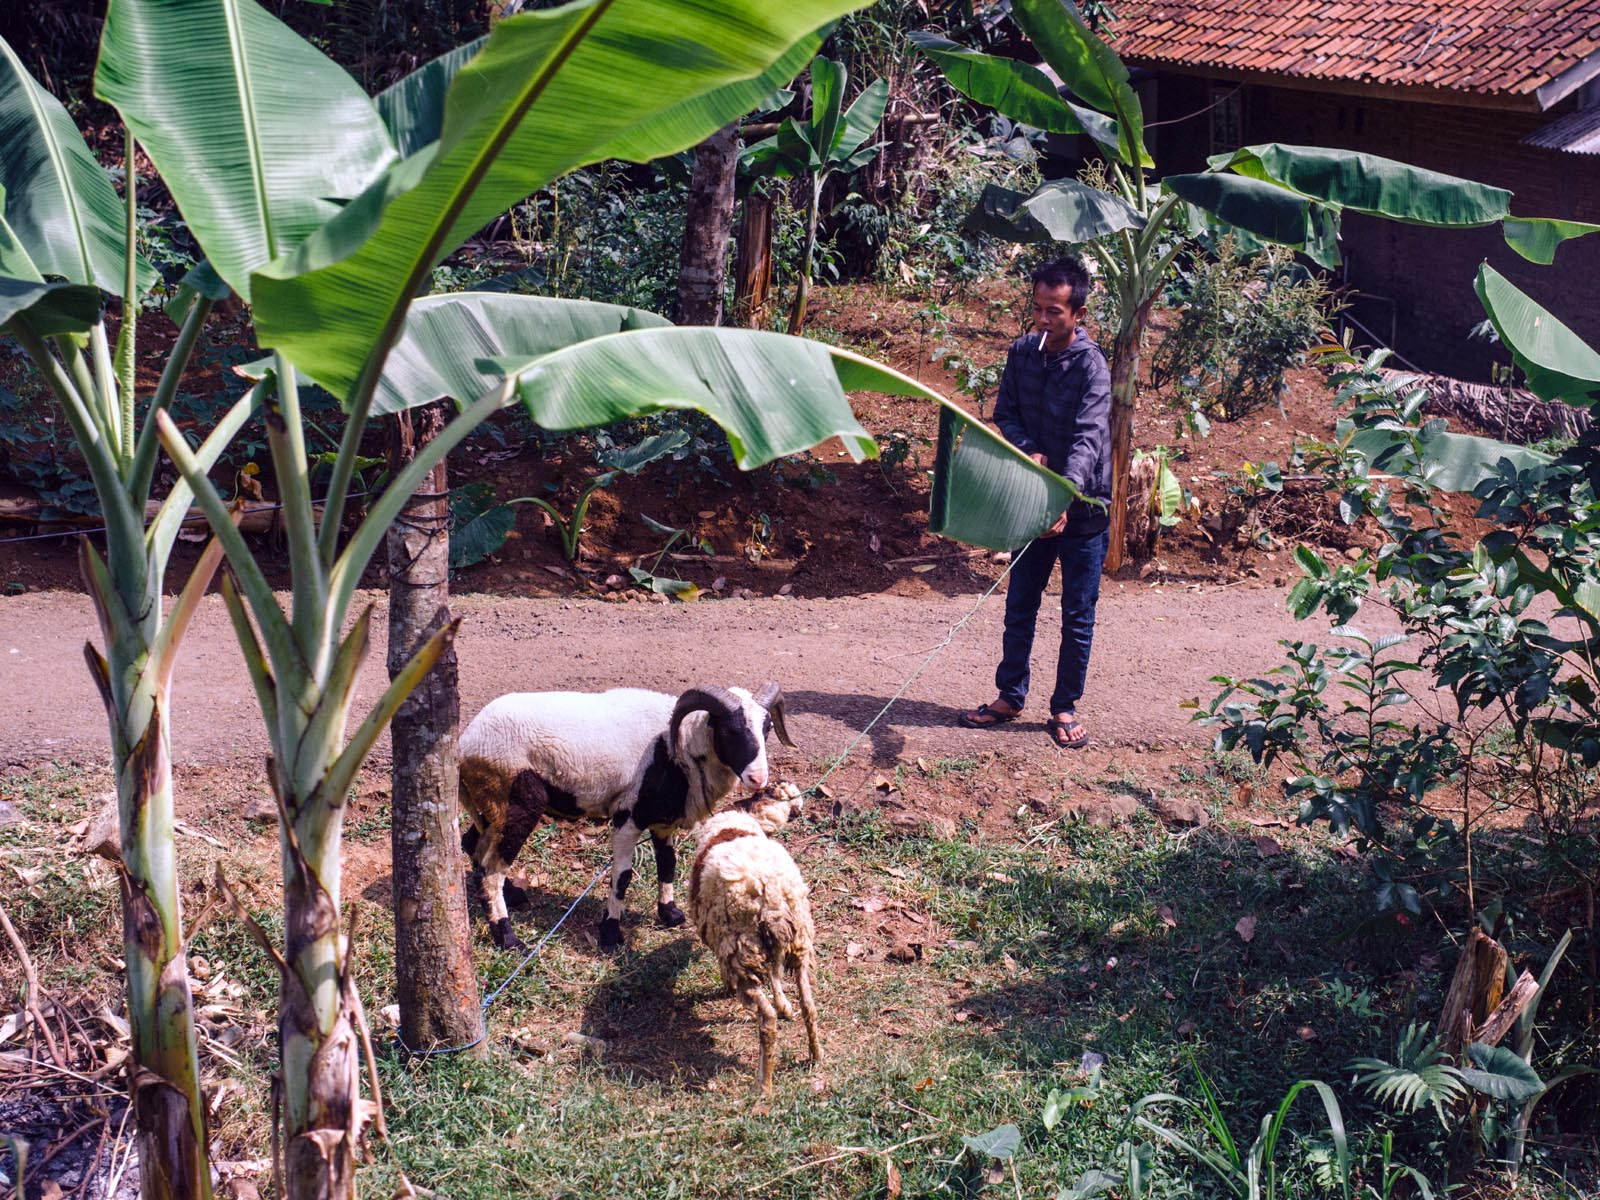 Man with sheep.